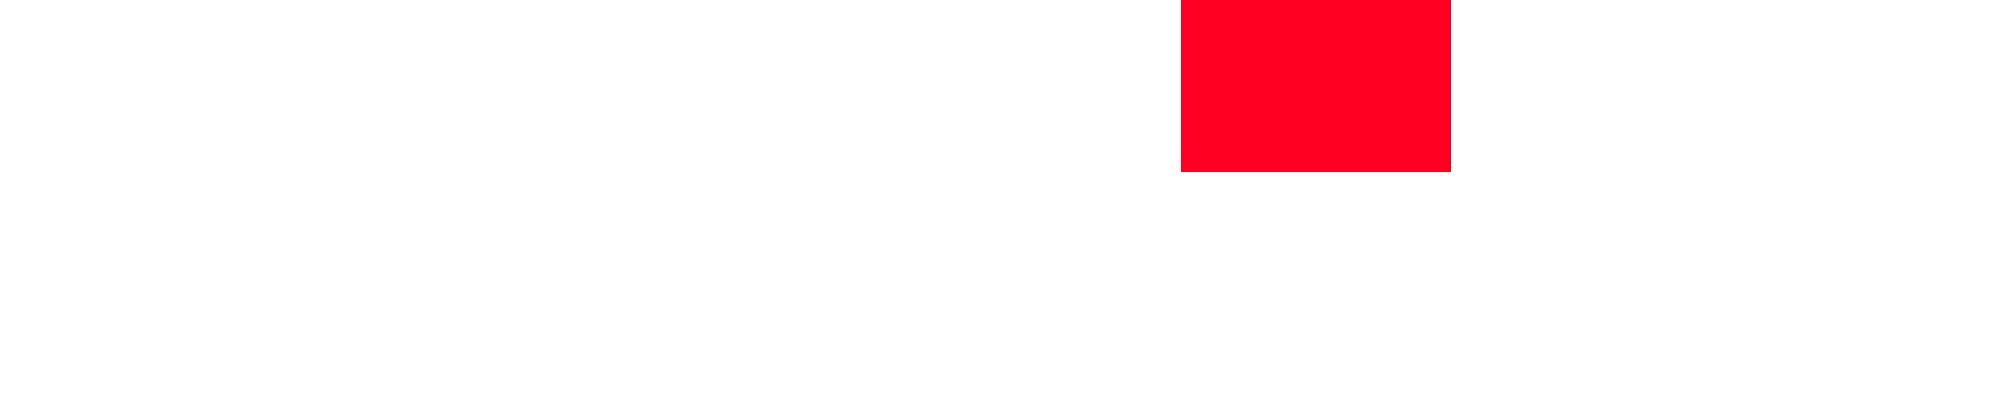 DELPHIRE-logo_KO-bright.png